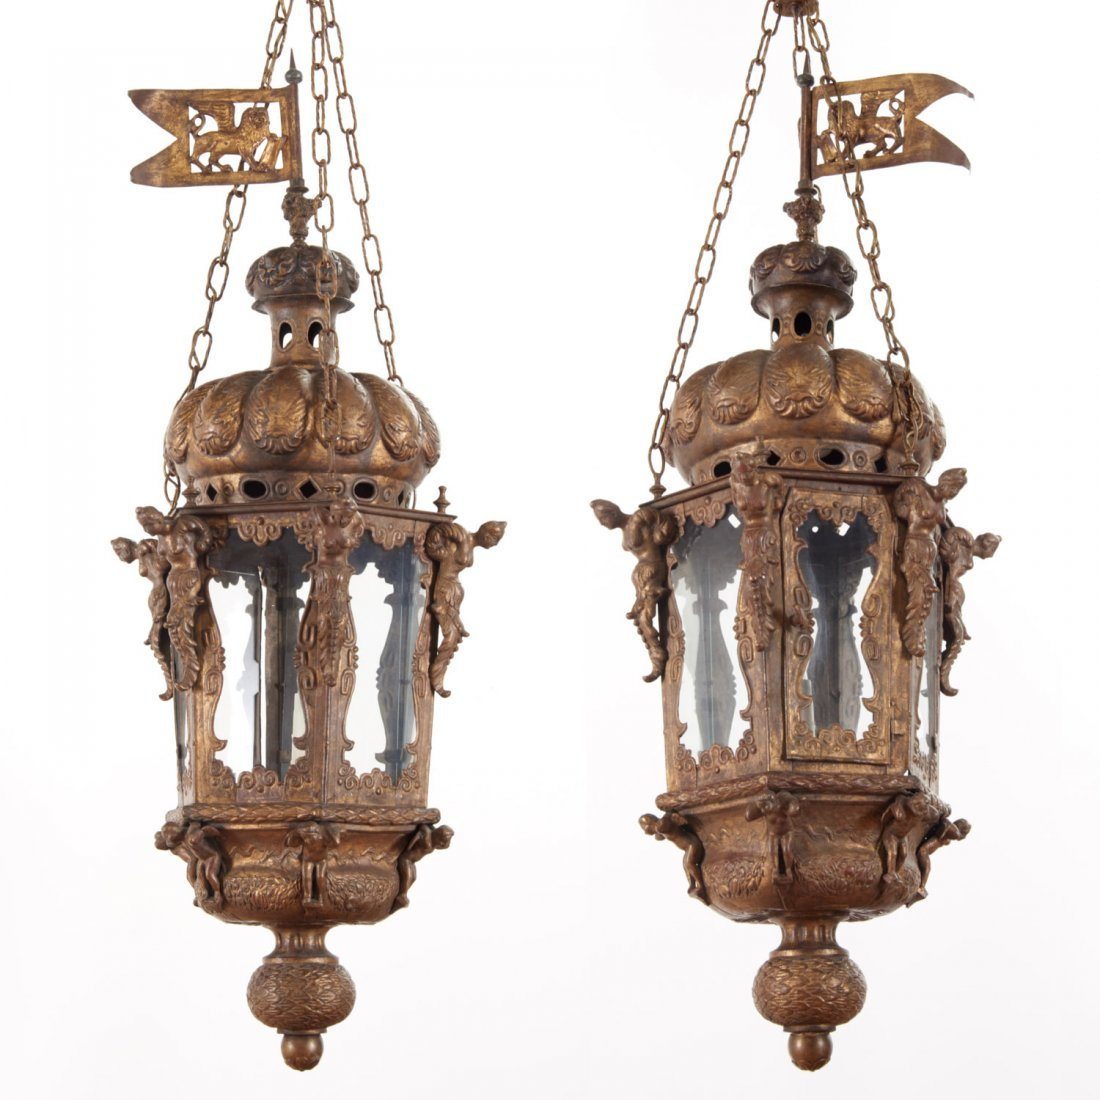 Large antique Venetian gilt metal hall lanterns